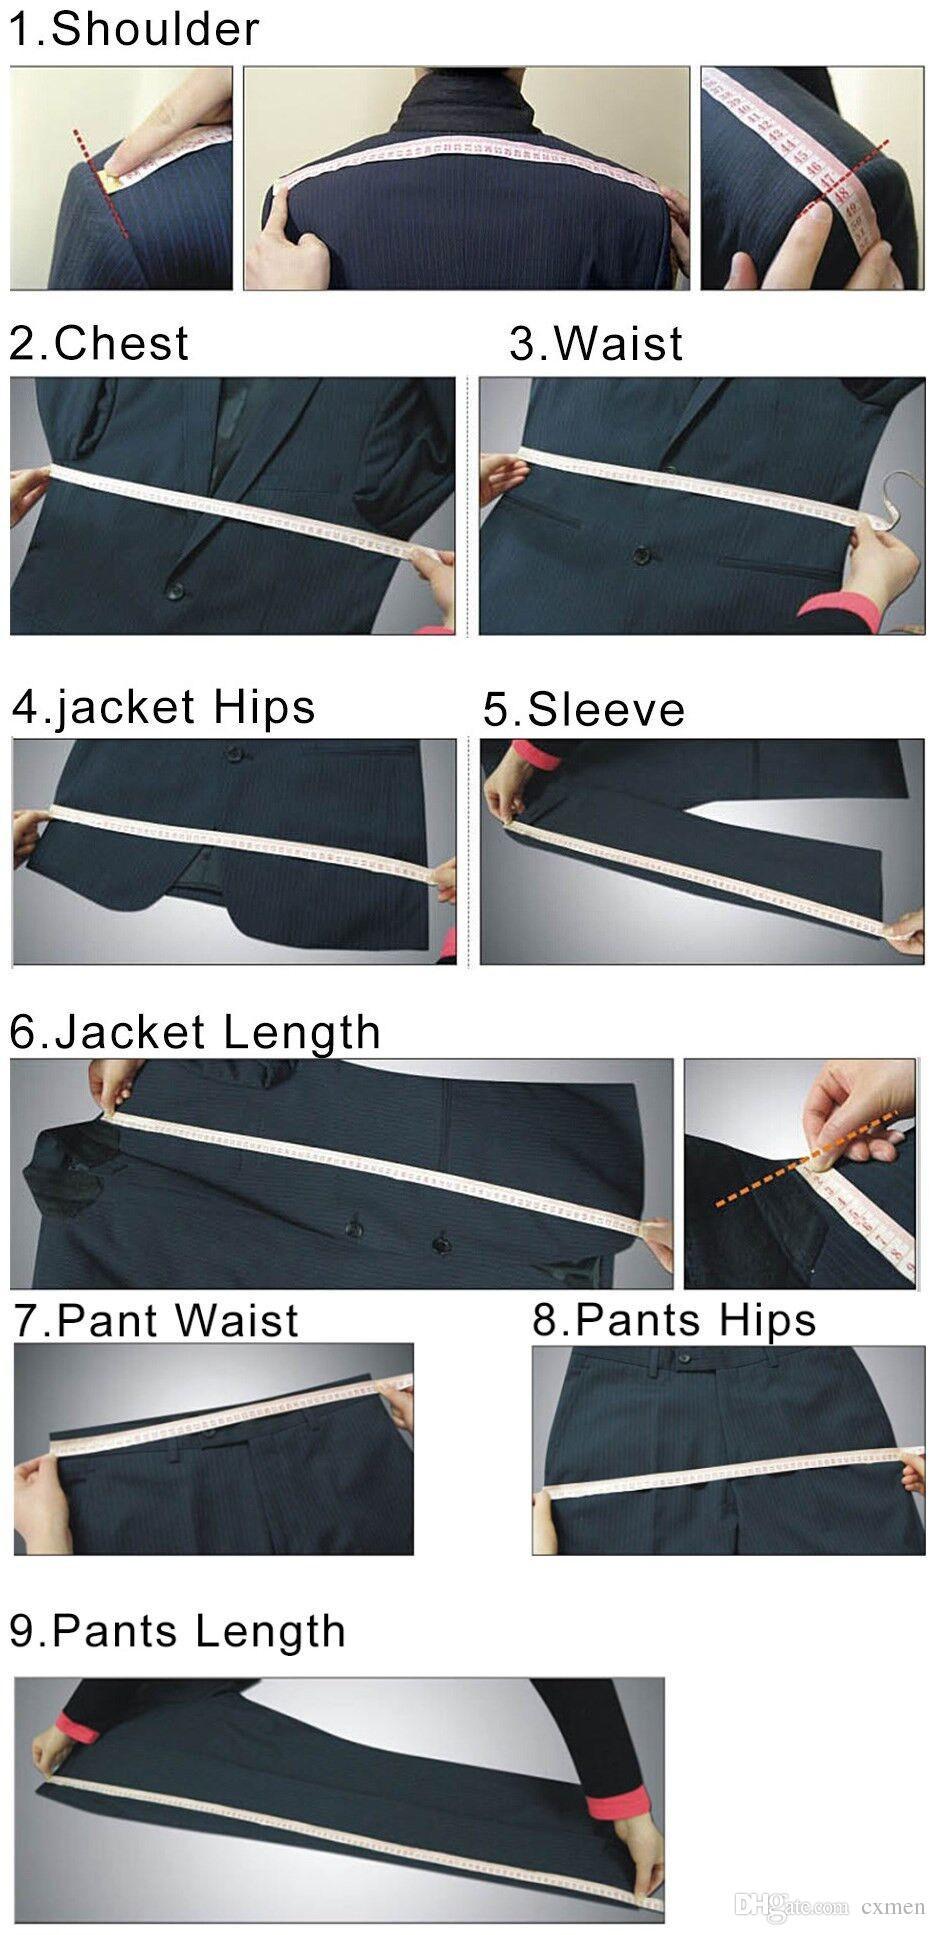 Latest Green Men Suits for Wedding Peaked Lapel Casual Prom Wear Slim Fit Men Blazer Groomsmen Outfit Groom Tuxedo Jacket+Pants+Vest